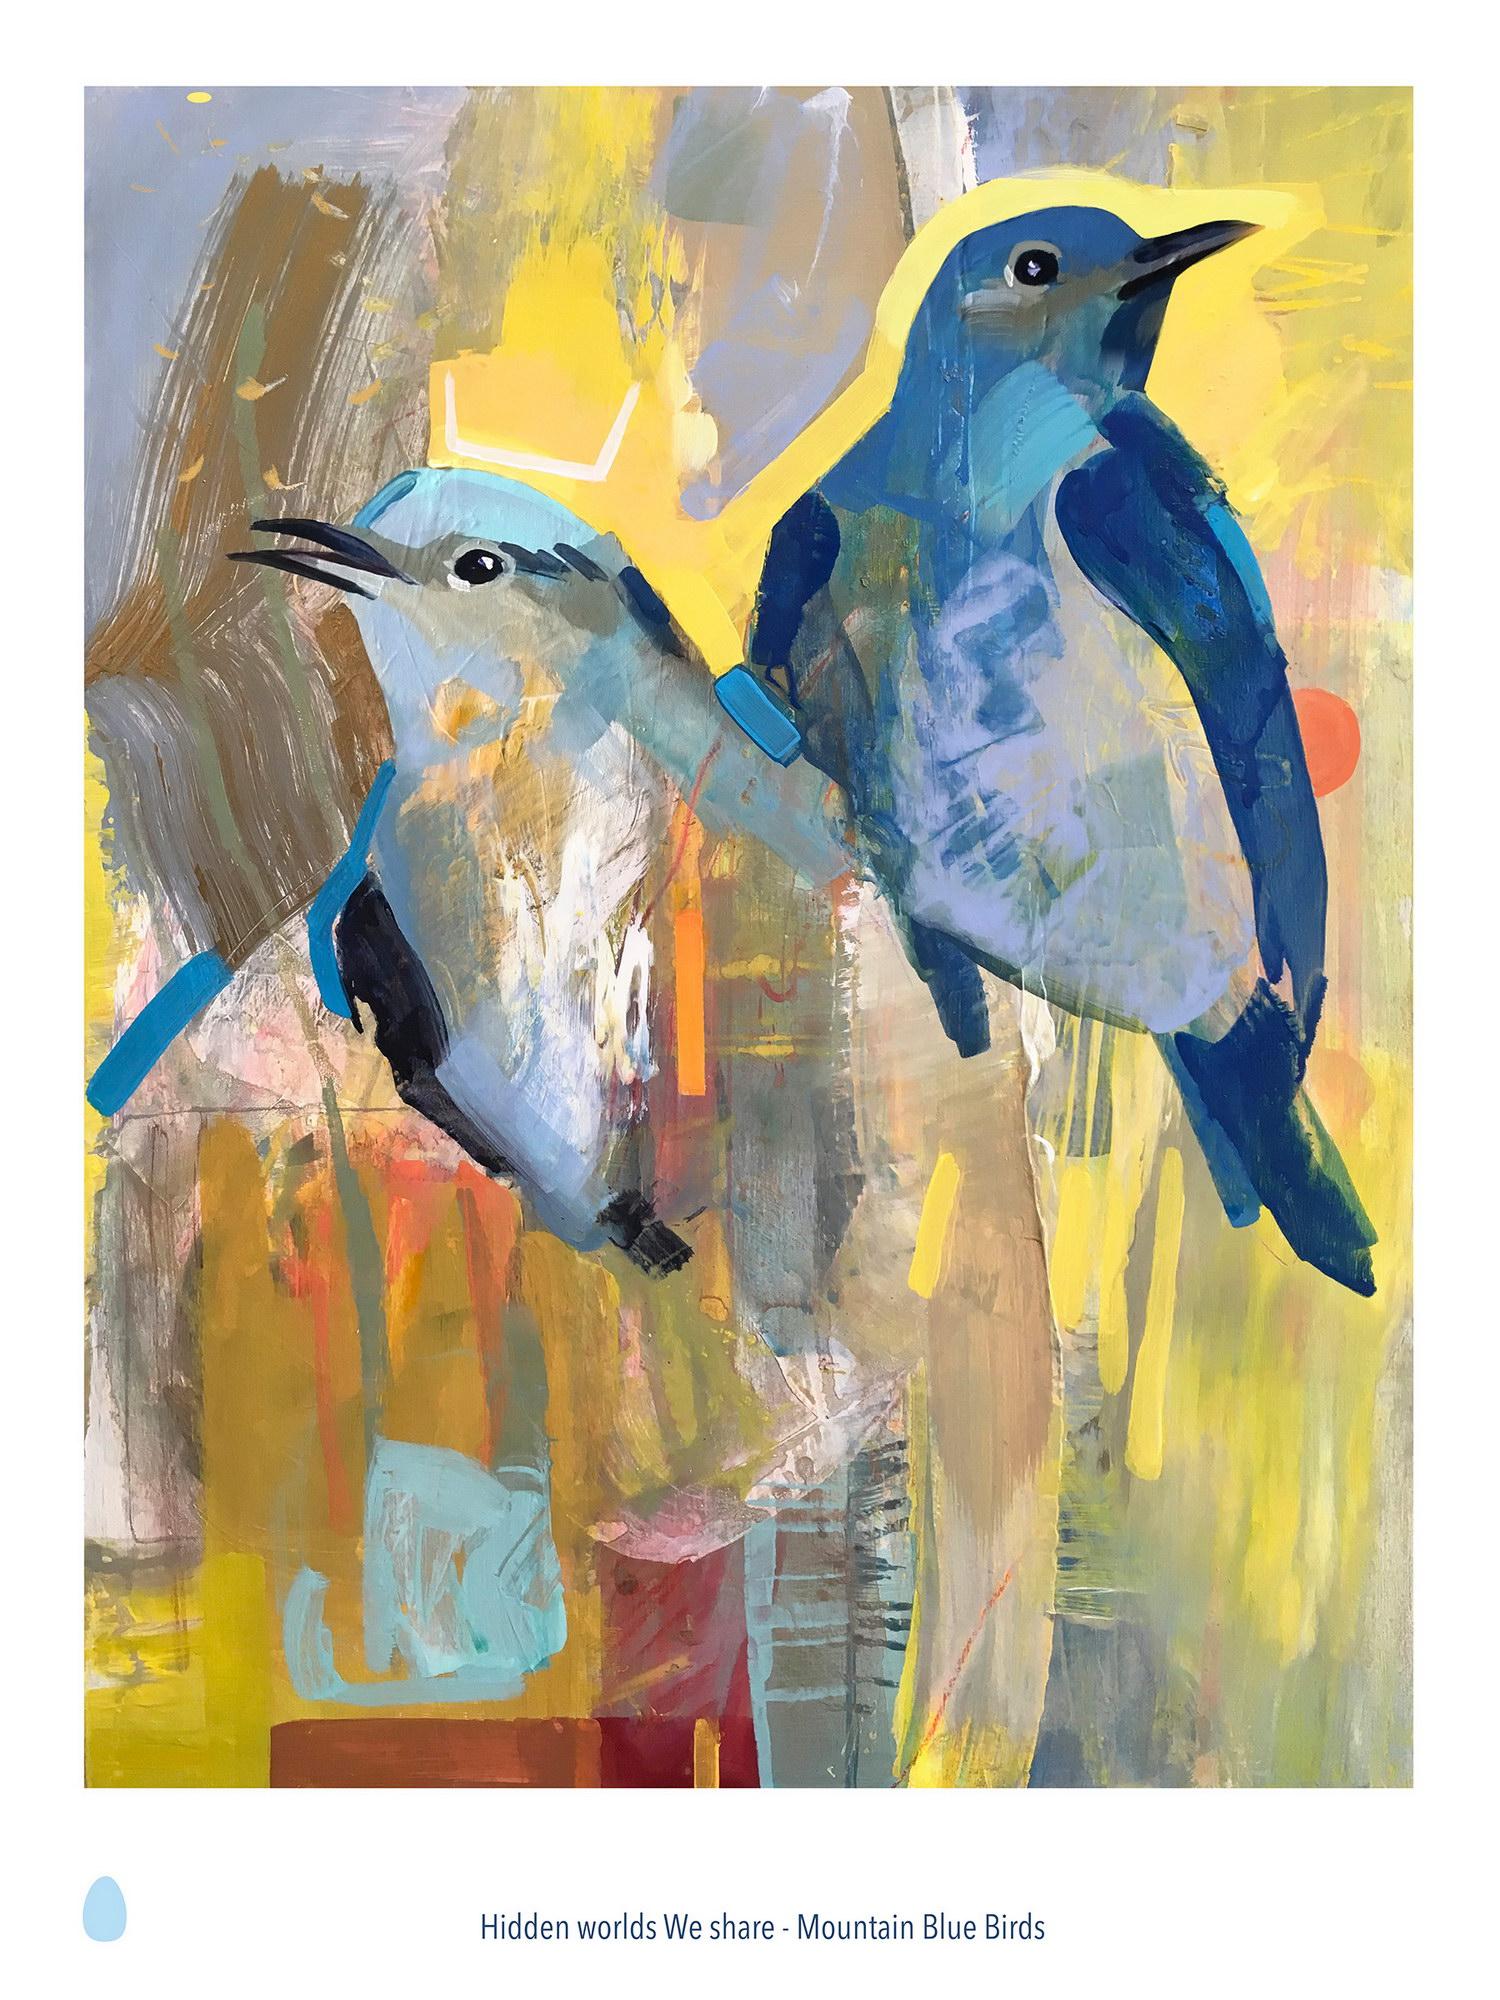 Sun and Sky - Mountain Bluebirds